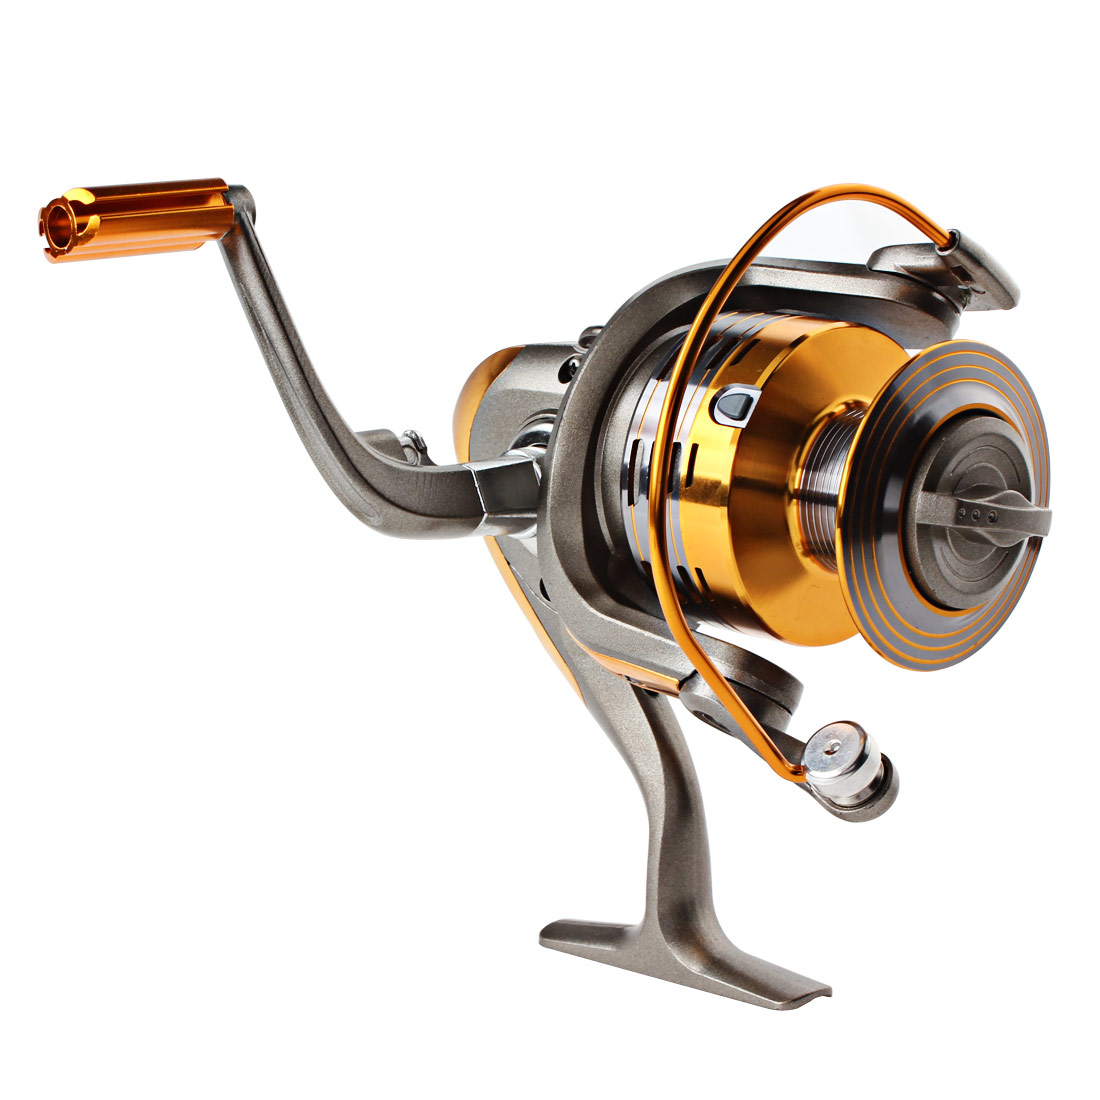 Aliexpress Buy Sales Series 11bb 4 7 1 Ratio Metal Fishing Reel Saltwater Freshwater